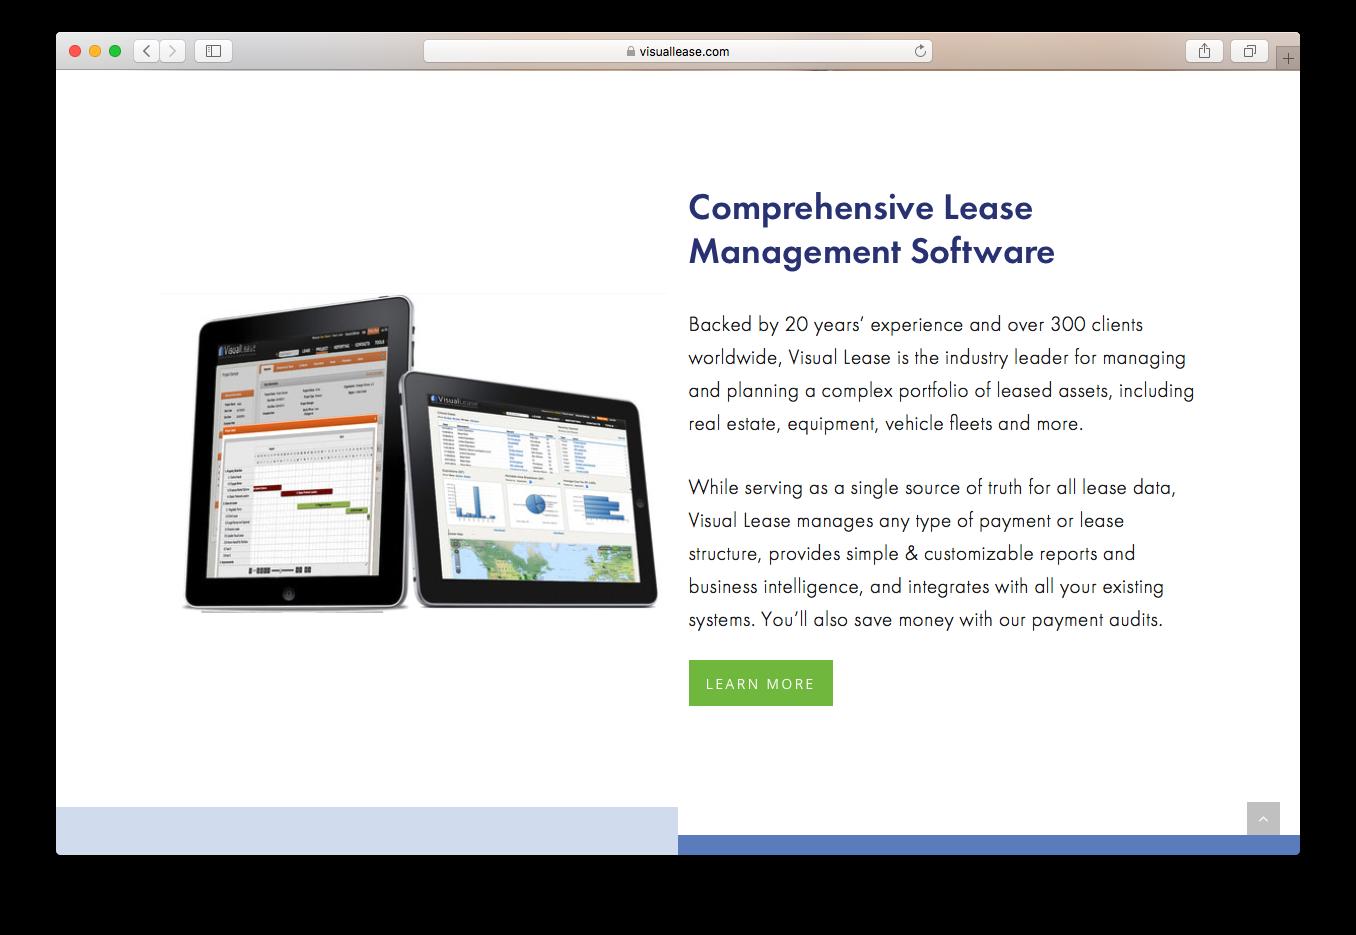 Visual Lease comprehensive management software manage plan portfolio assets